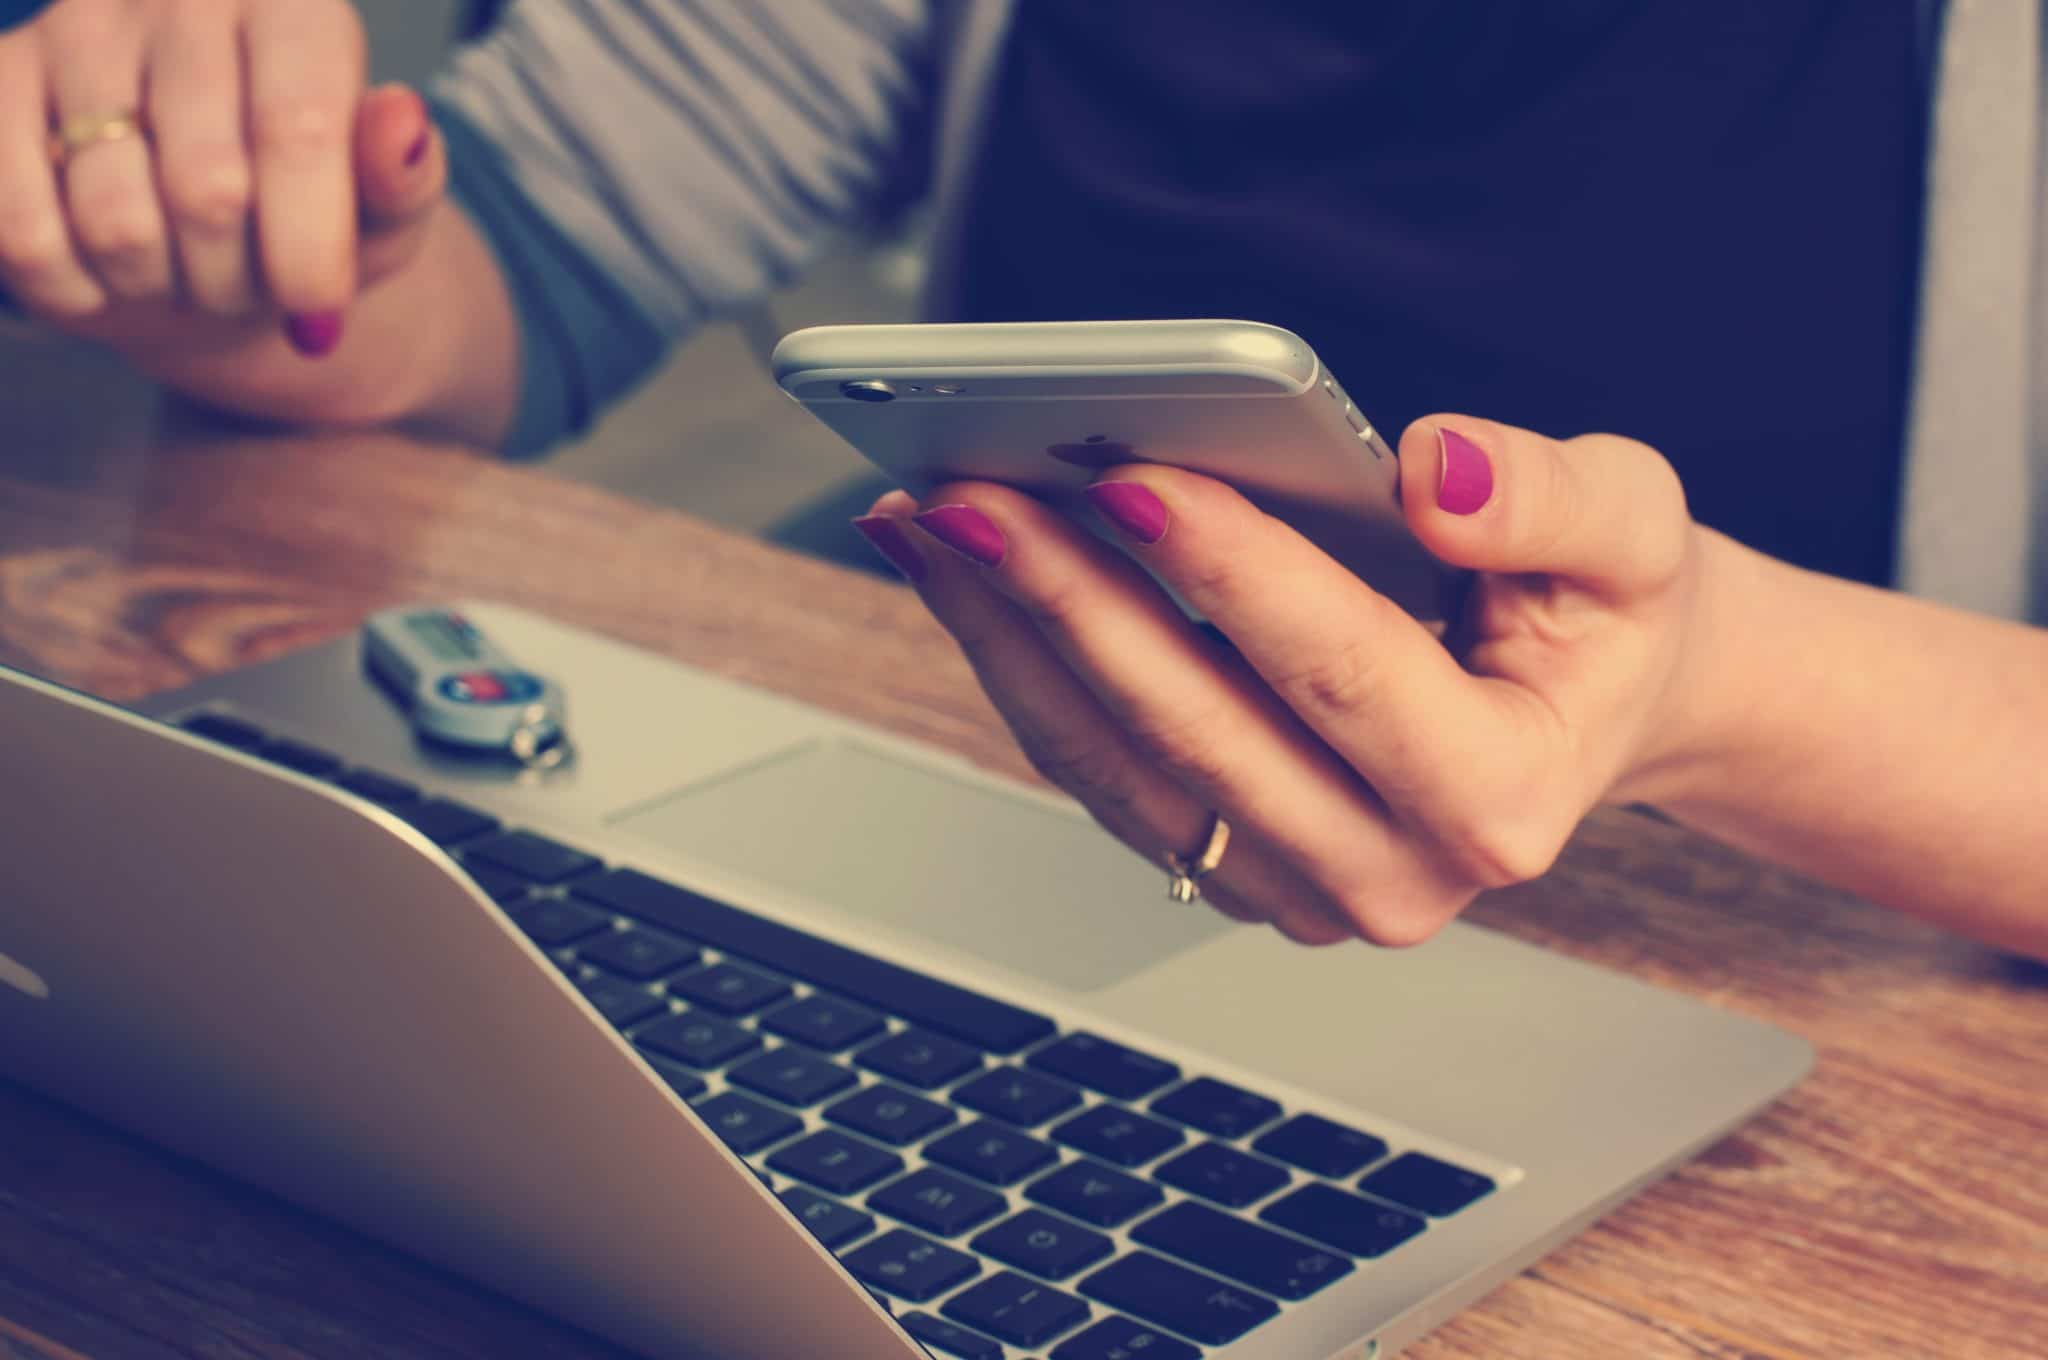 mobile-phone-affinity-employee-engagement